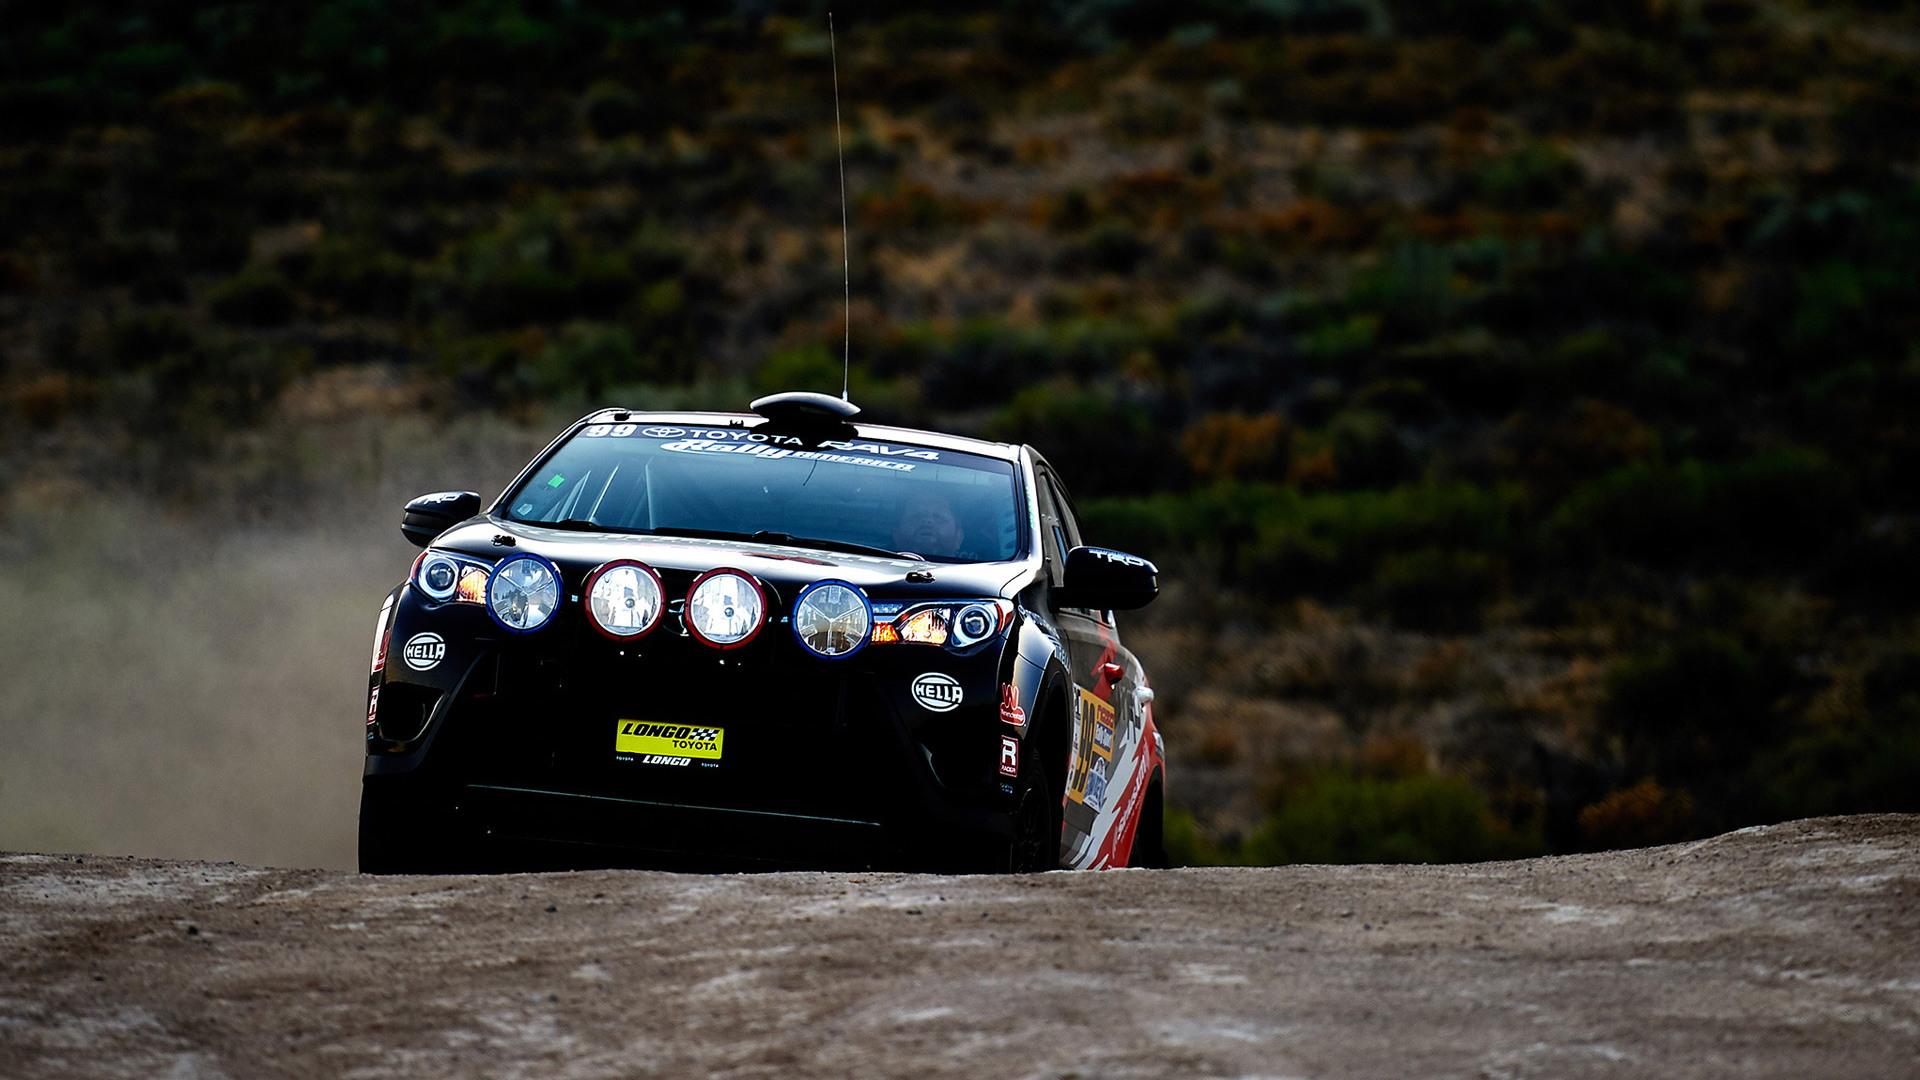 2015 Toyota Rally RAV4